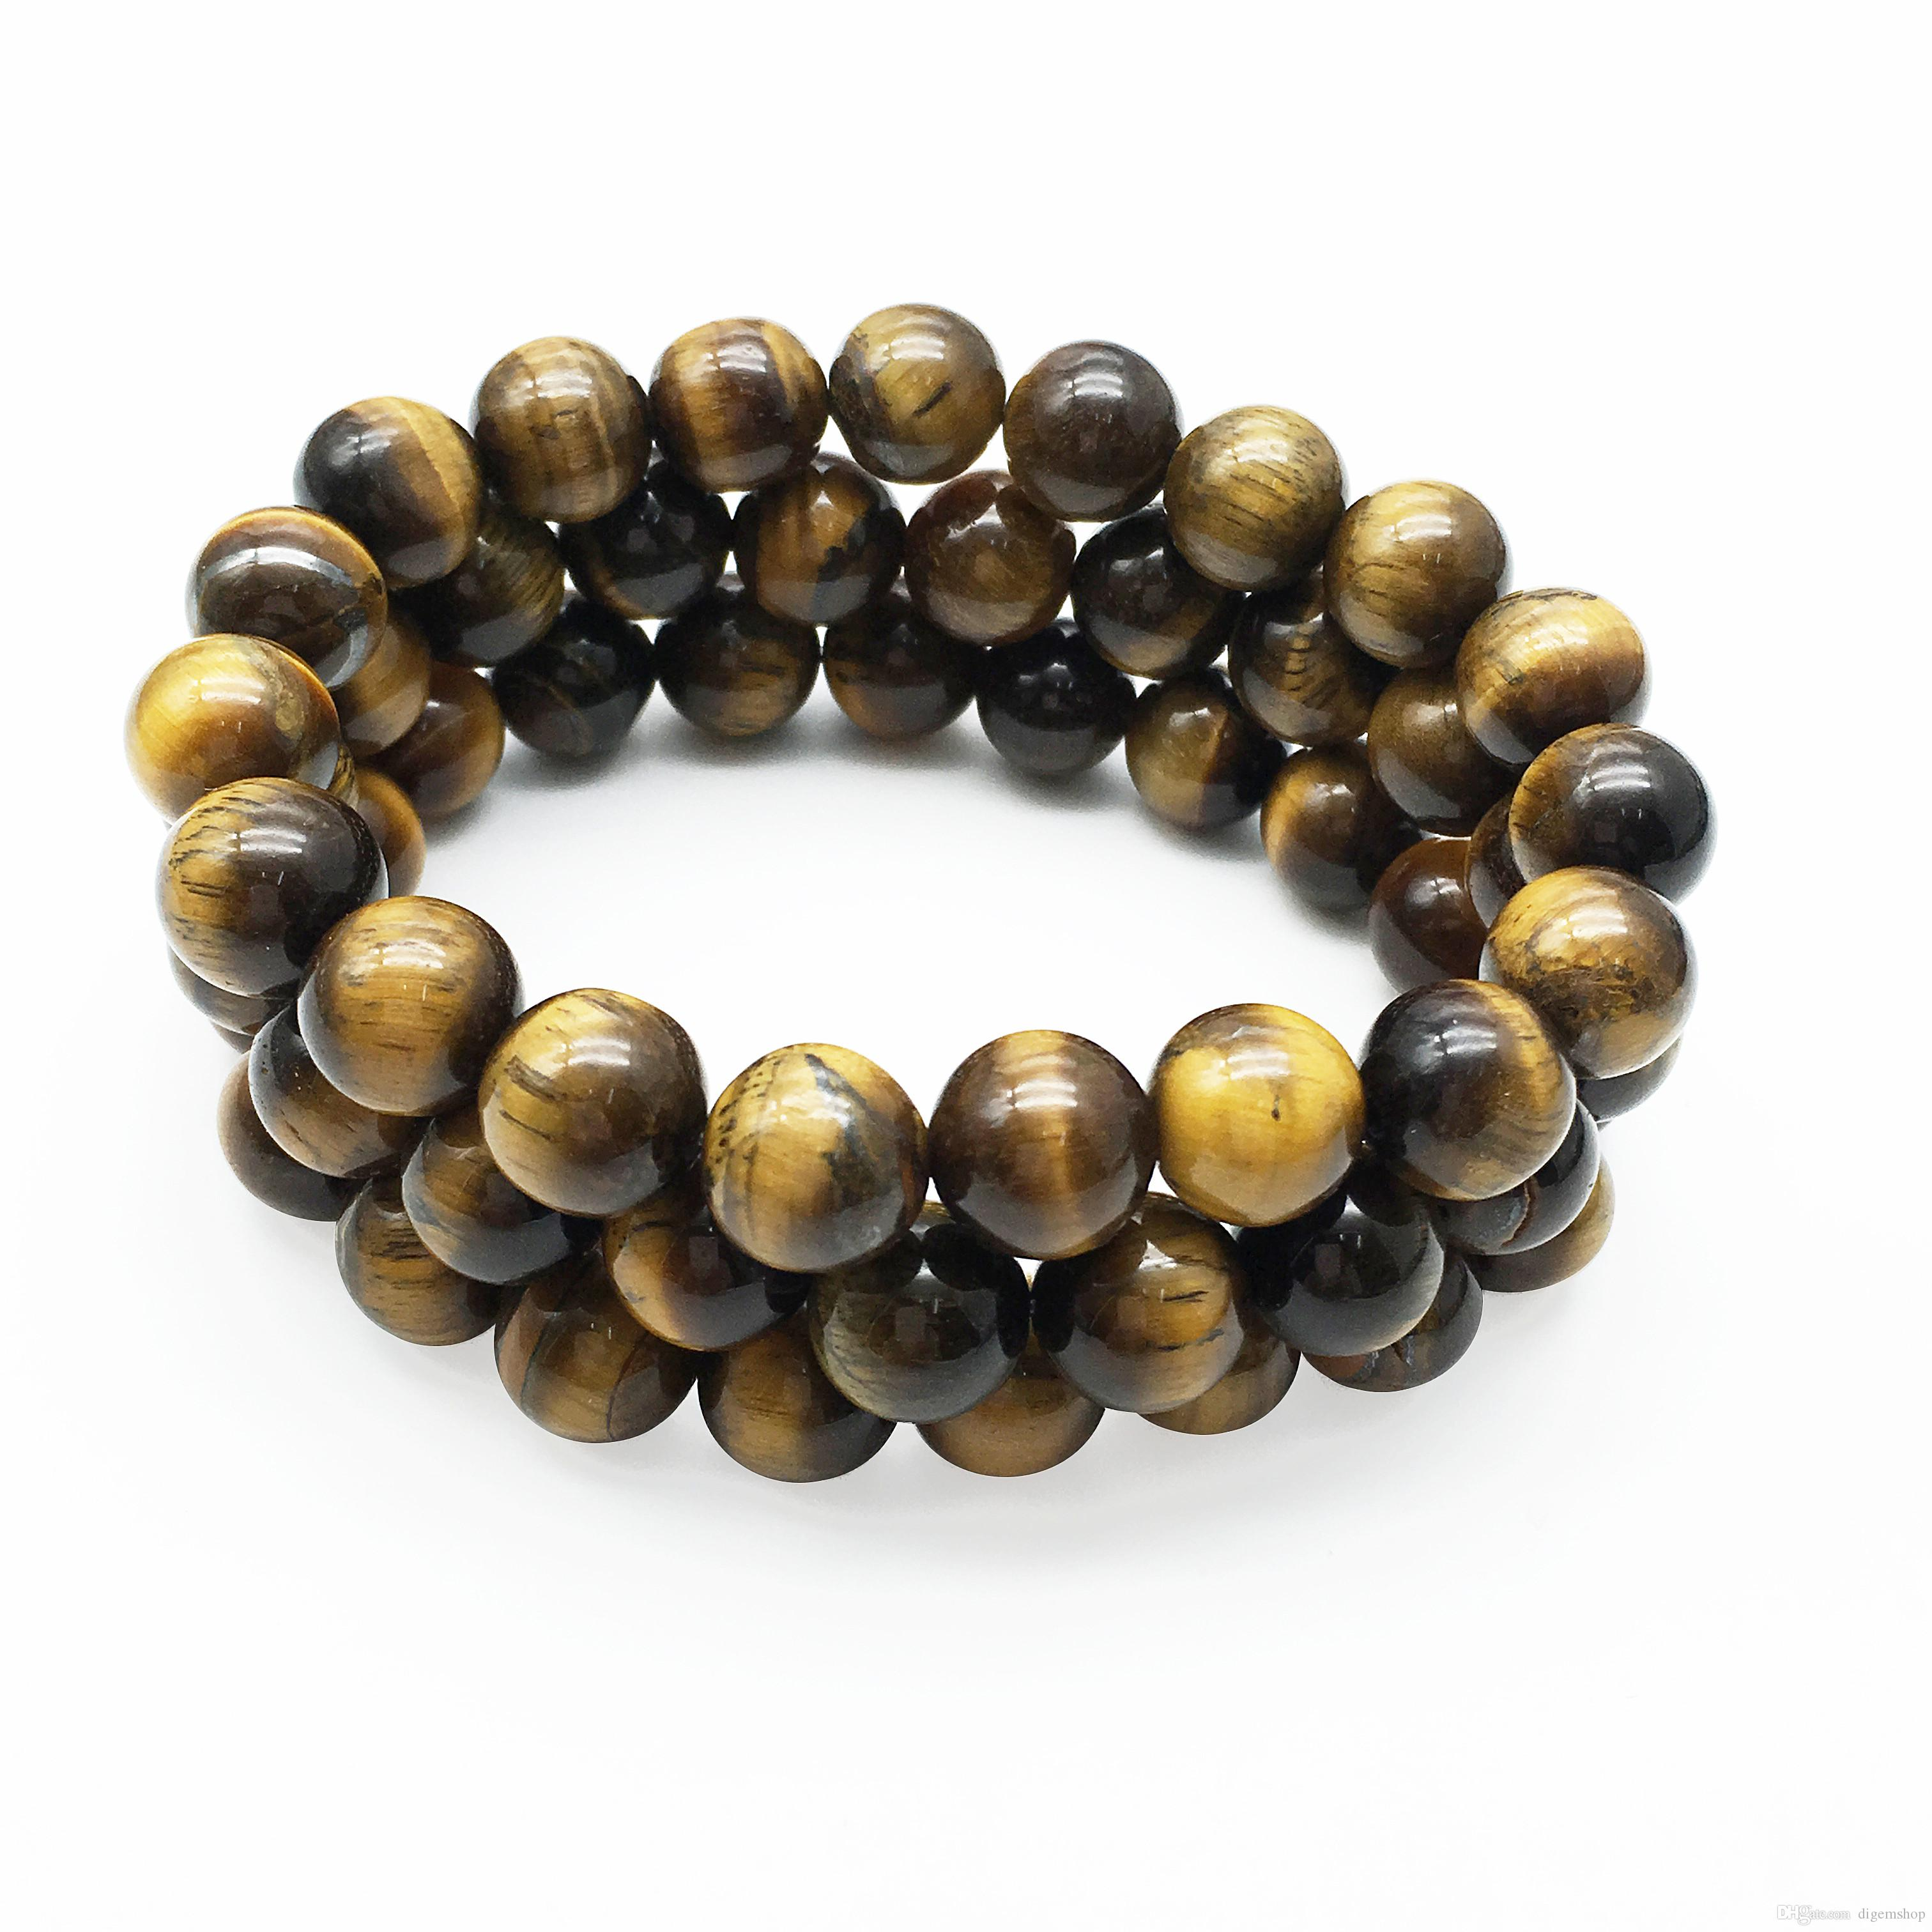 10mm Gelb Tiger Eye Armband, Edelstein Armband, Tiger Eye Perlen, elastisches Armband, Perlen Armband viel Glück Armband